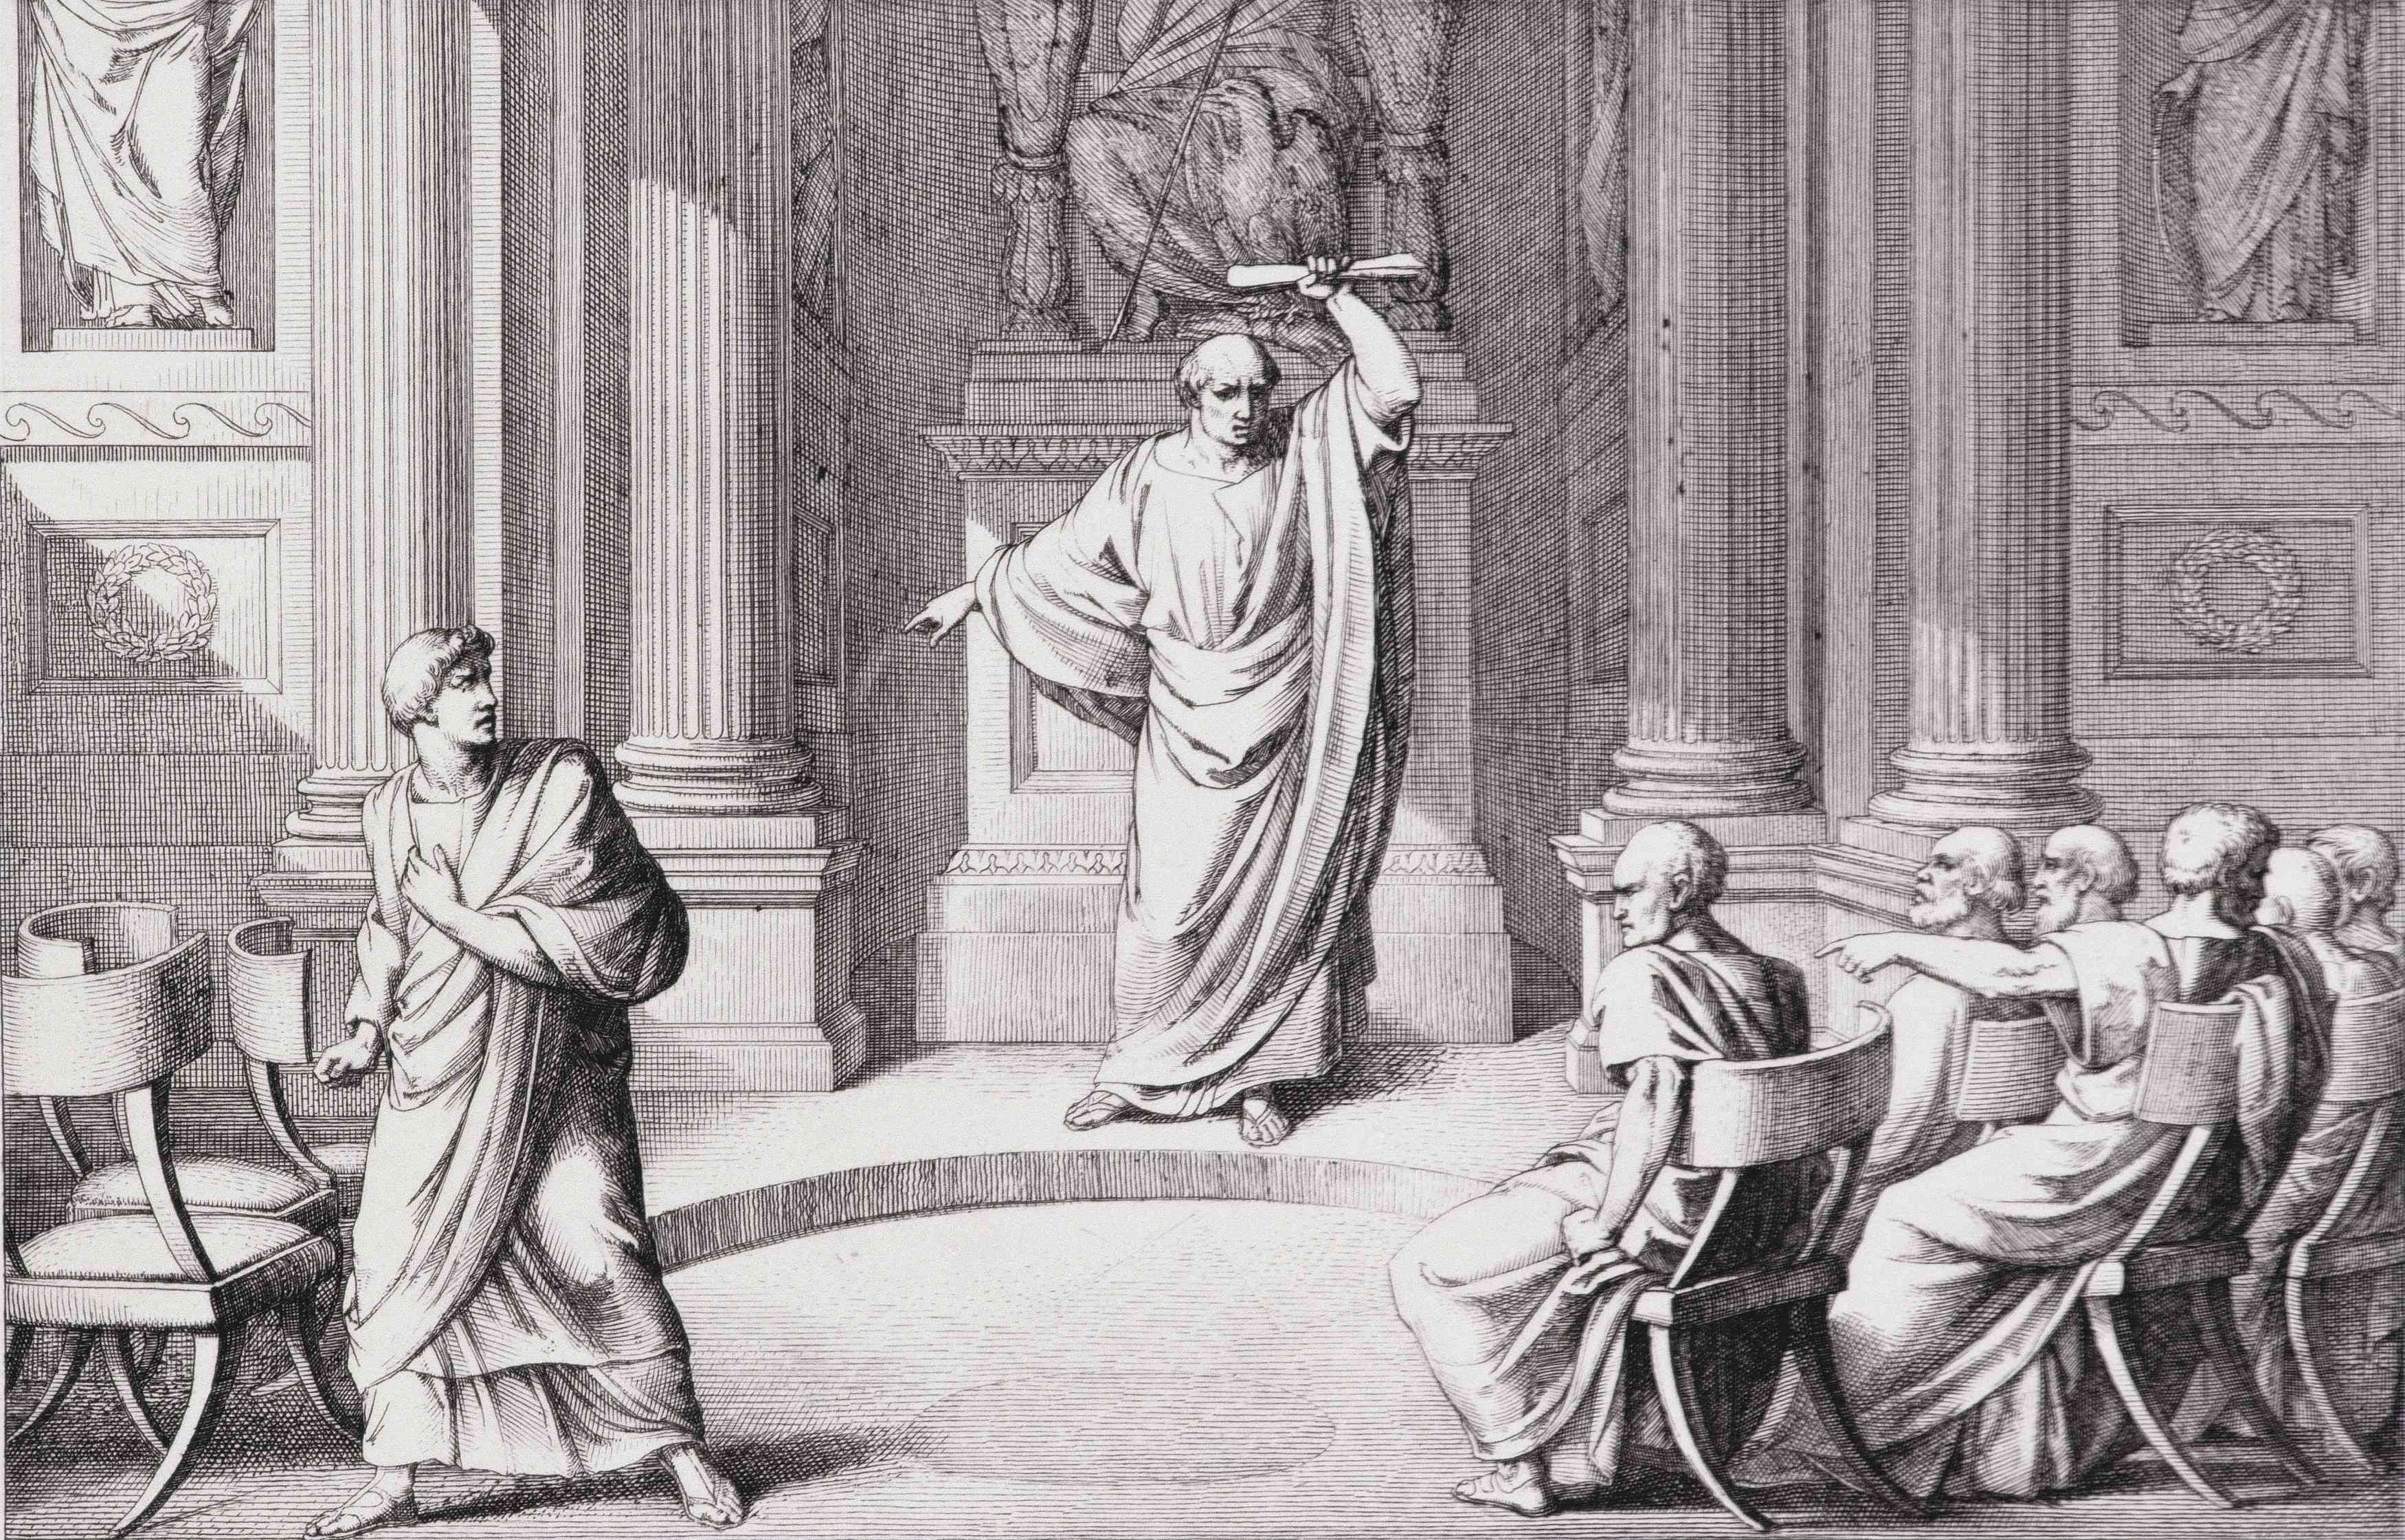 Cicero Denouncing Catiline, engraved by B. Barloccini, 1849